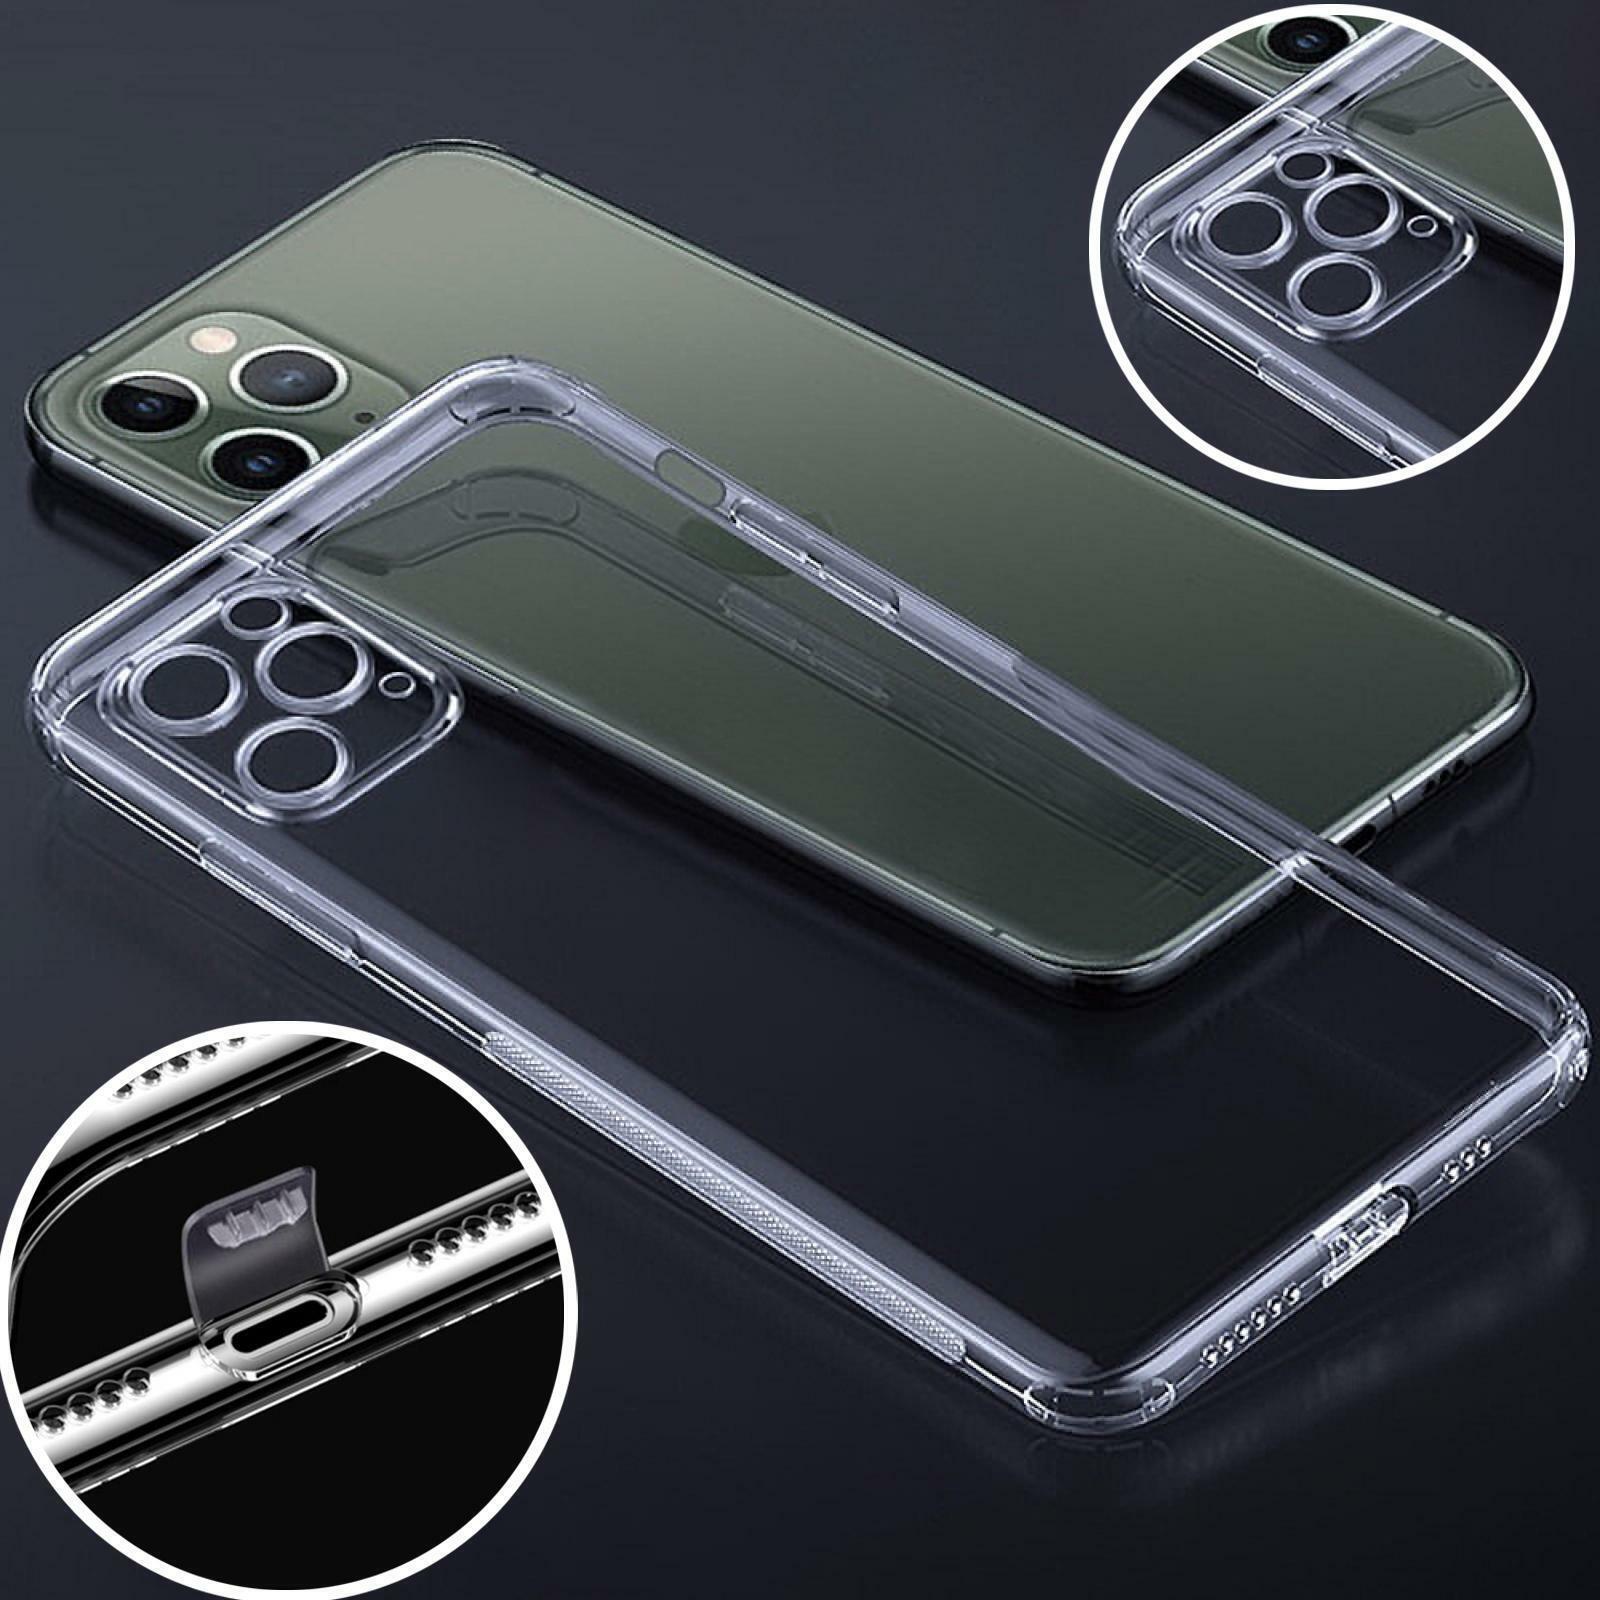 Handy Hülle Schutzhülle TPU Silikon Case Tasche Schutz Cover Bumper Transparent